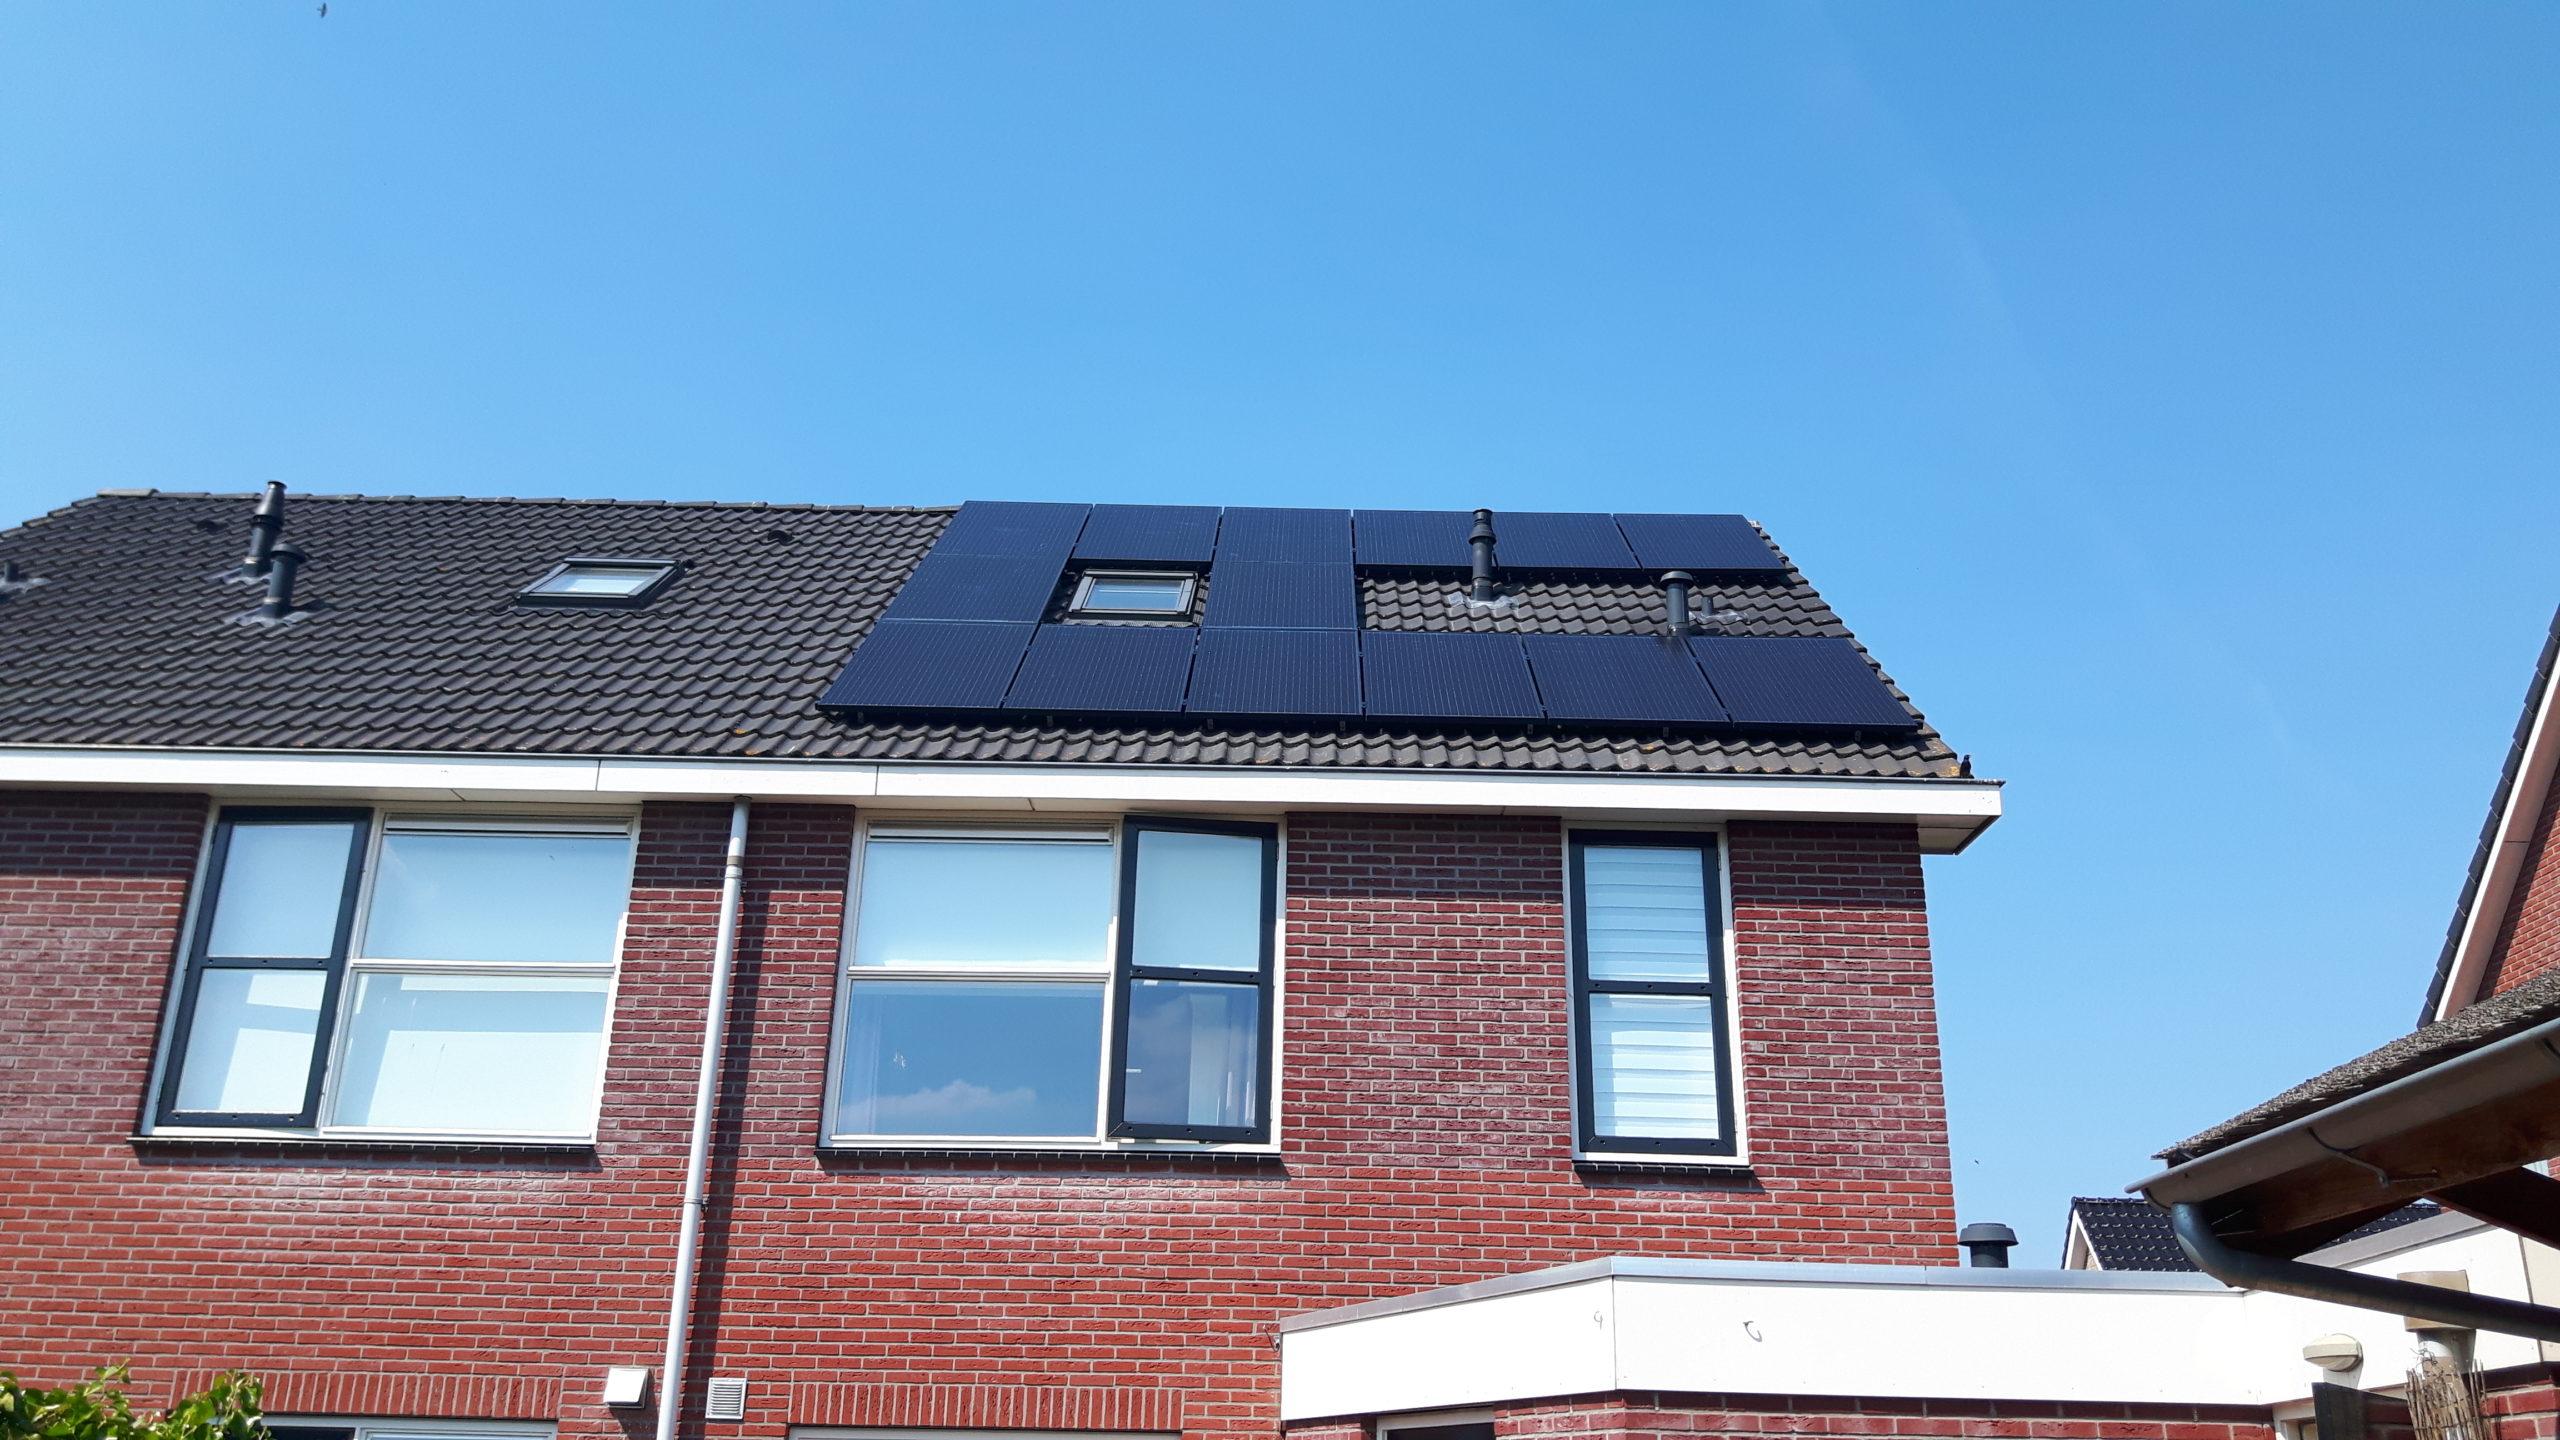 Solarwatt glas glas zonnepanelen Nieuwlande